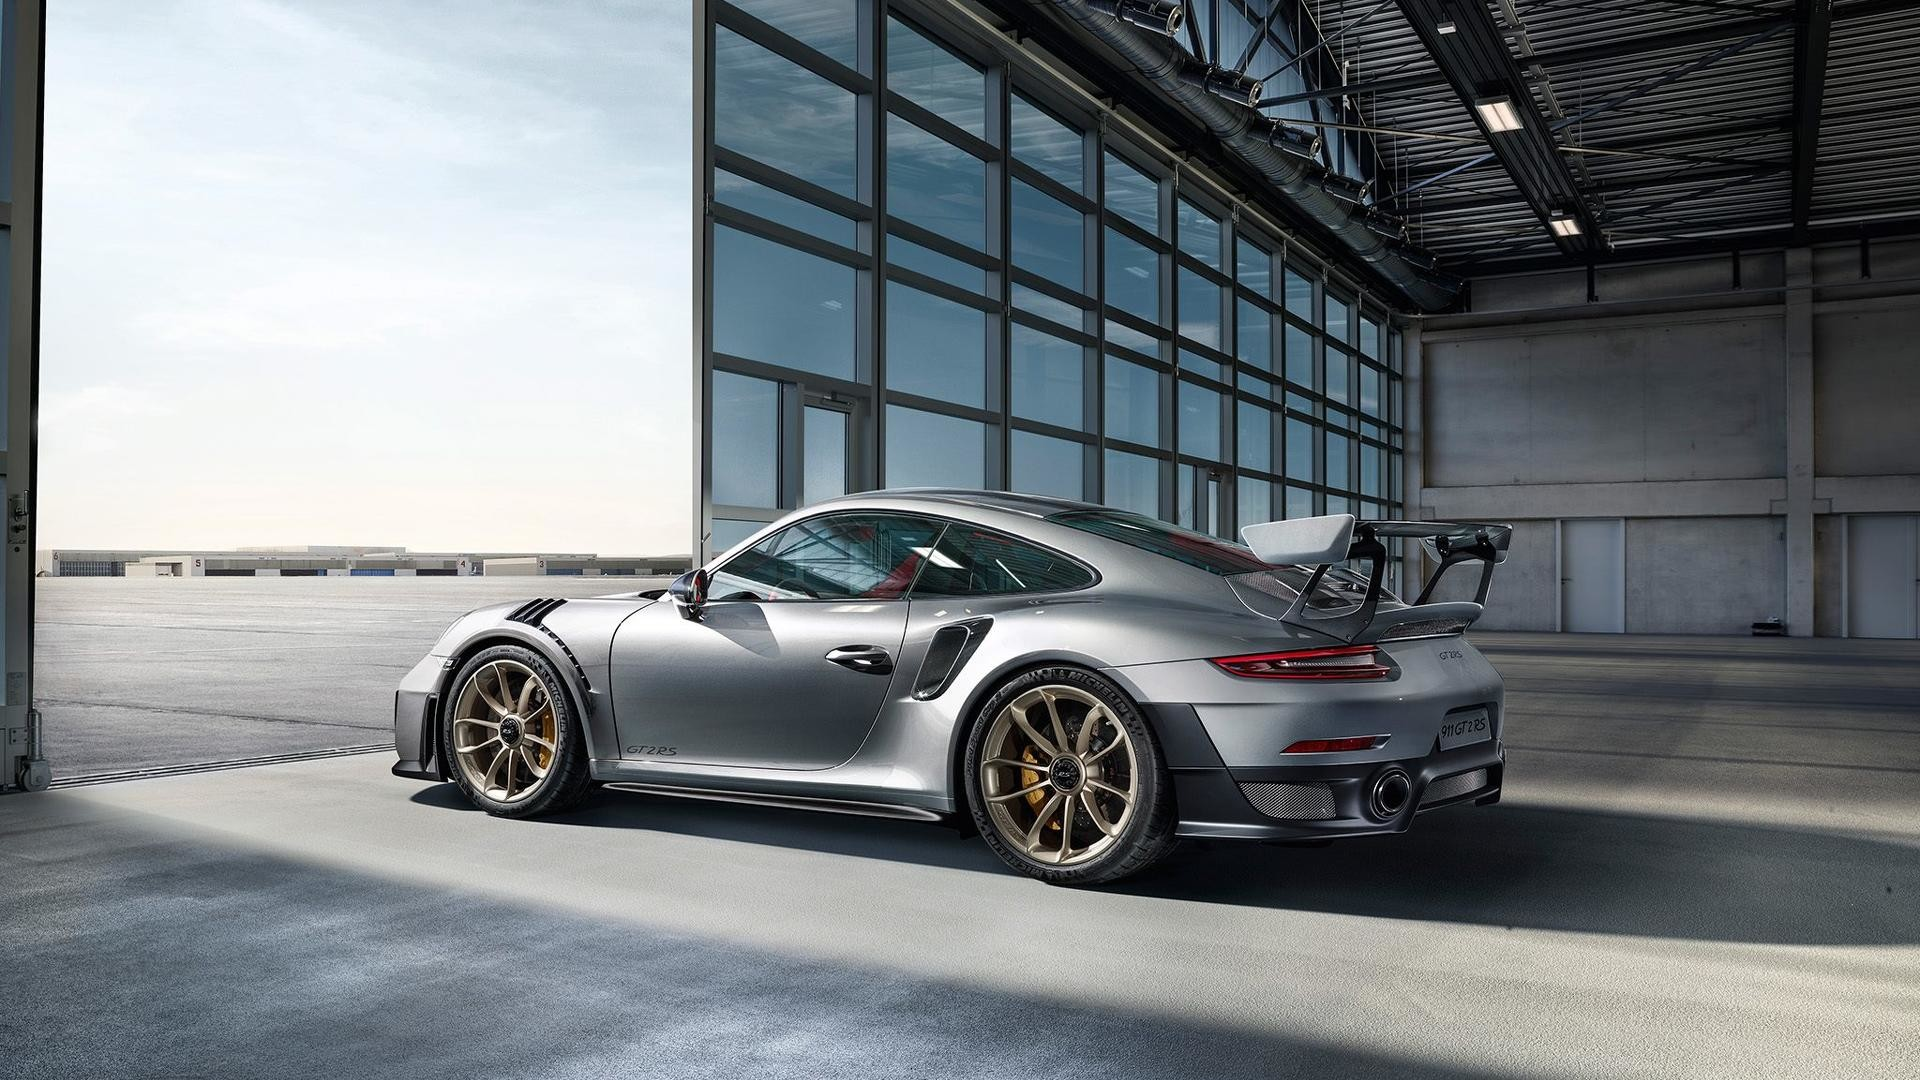 Porsche 911 Hd Wallpapers 83 Images